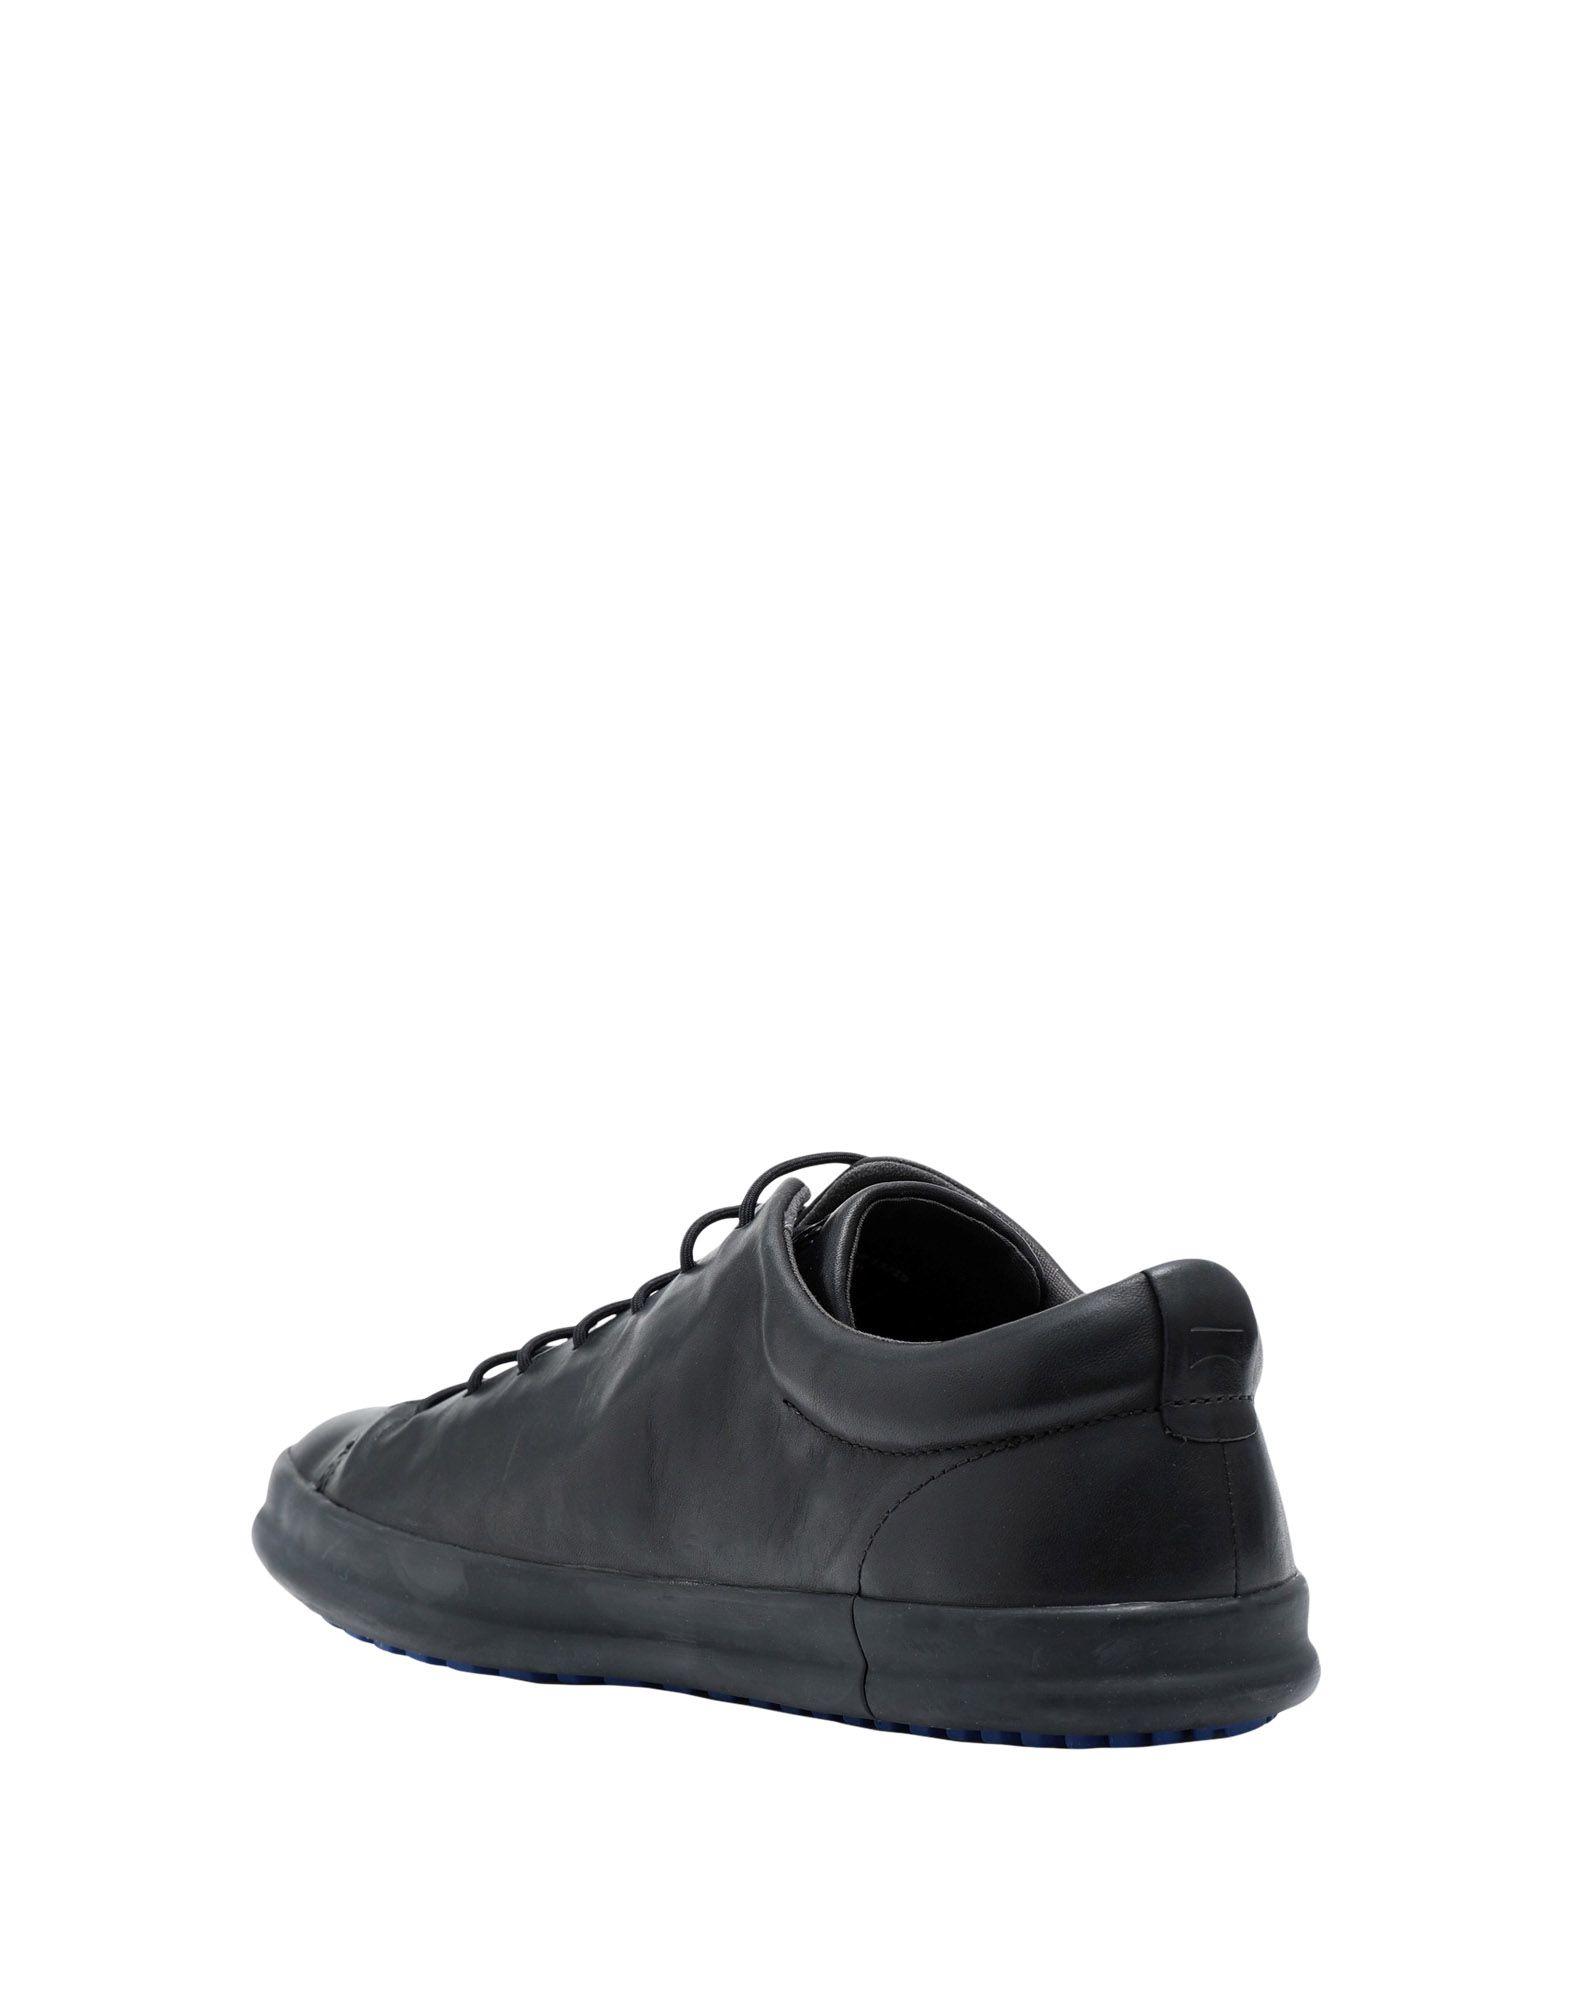 Camper Sneakers - Men Camper Sneakers - online on  Canada - Sneakers 11555397FA a4cfd6